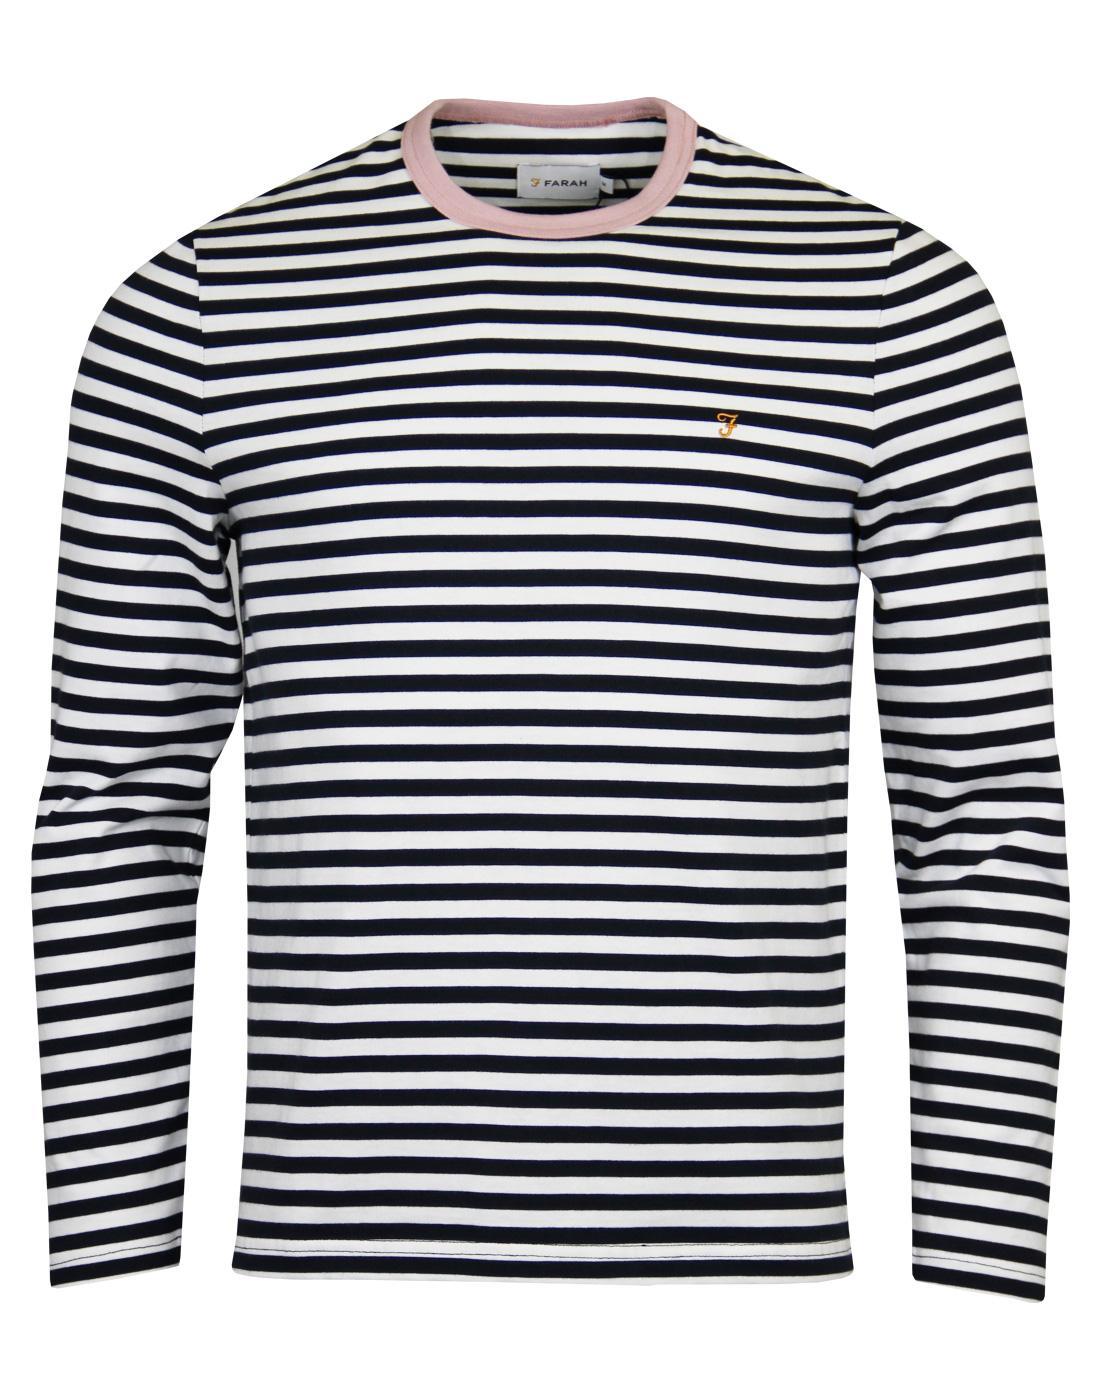 Trafford FARAH Retro Mod LS Stripe Ringer T-shirt